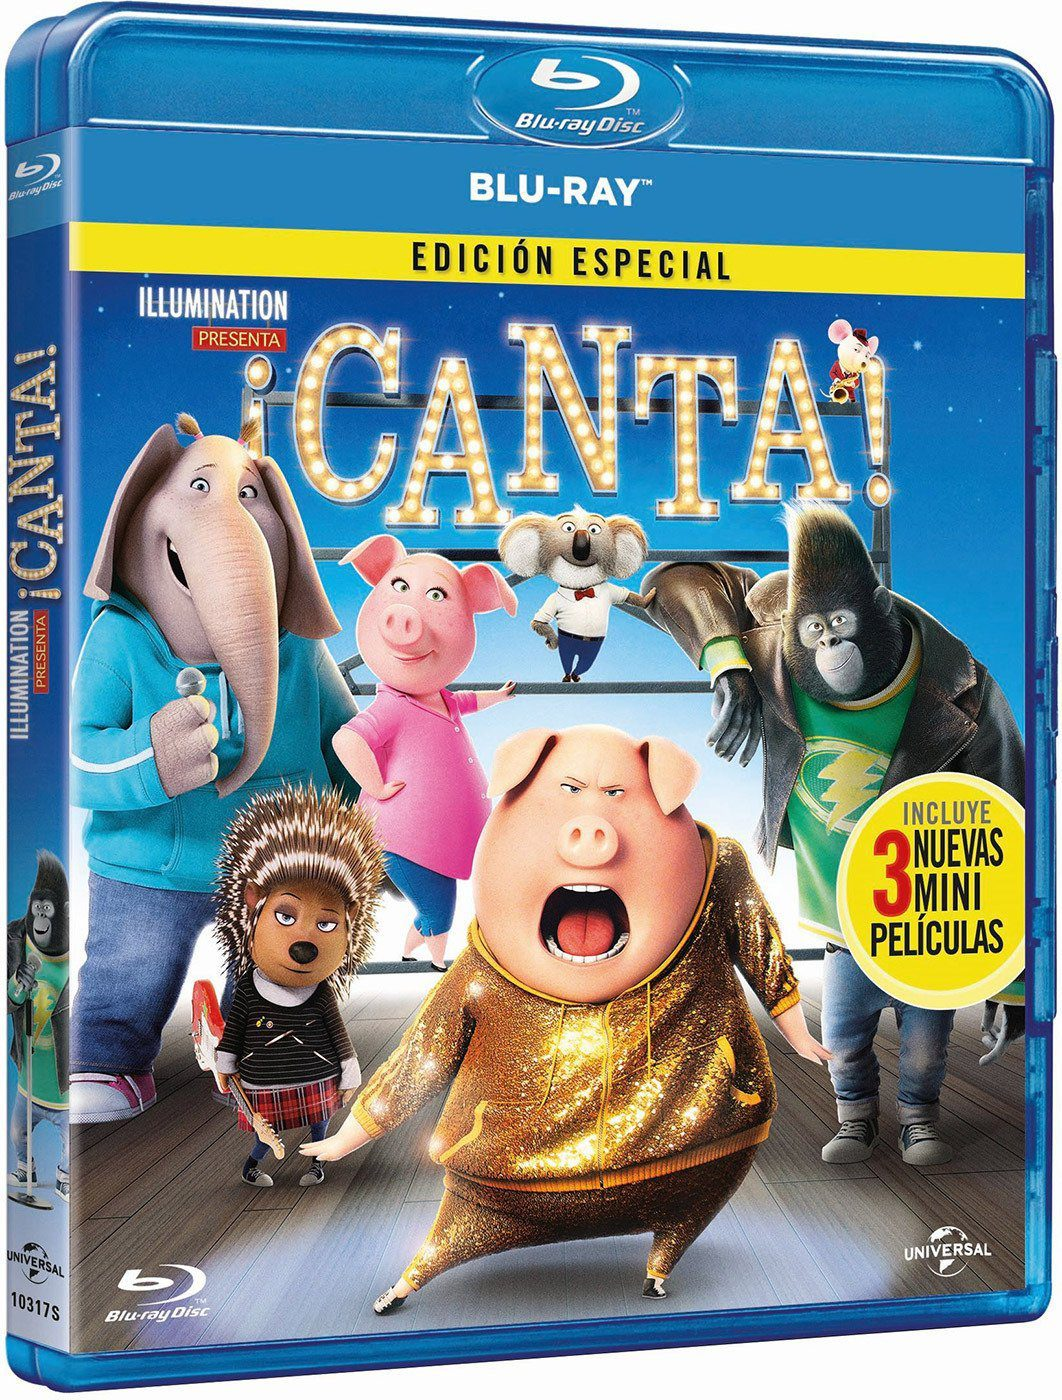 """¡Canta!"" en 4K, 3D, Blu-ray y Dvd el 26 de abril • En tu pantalla"